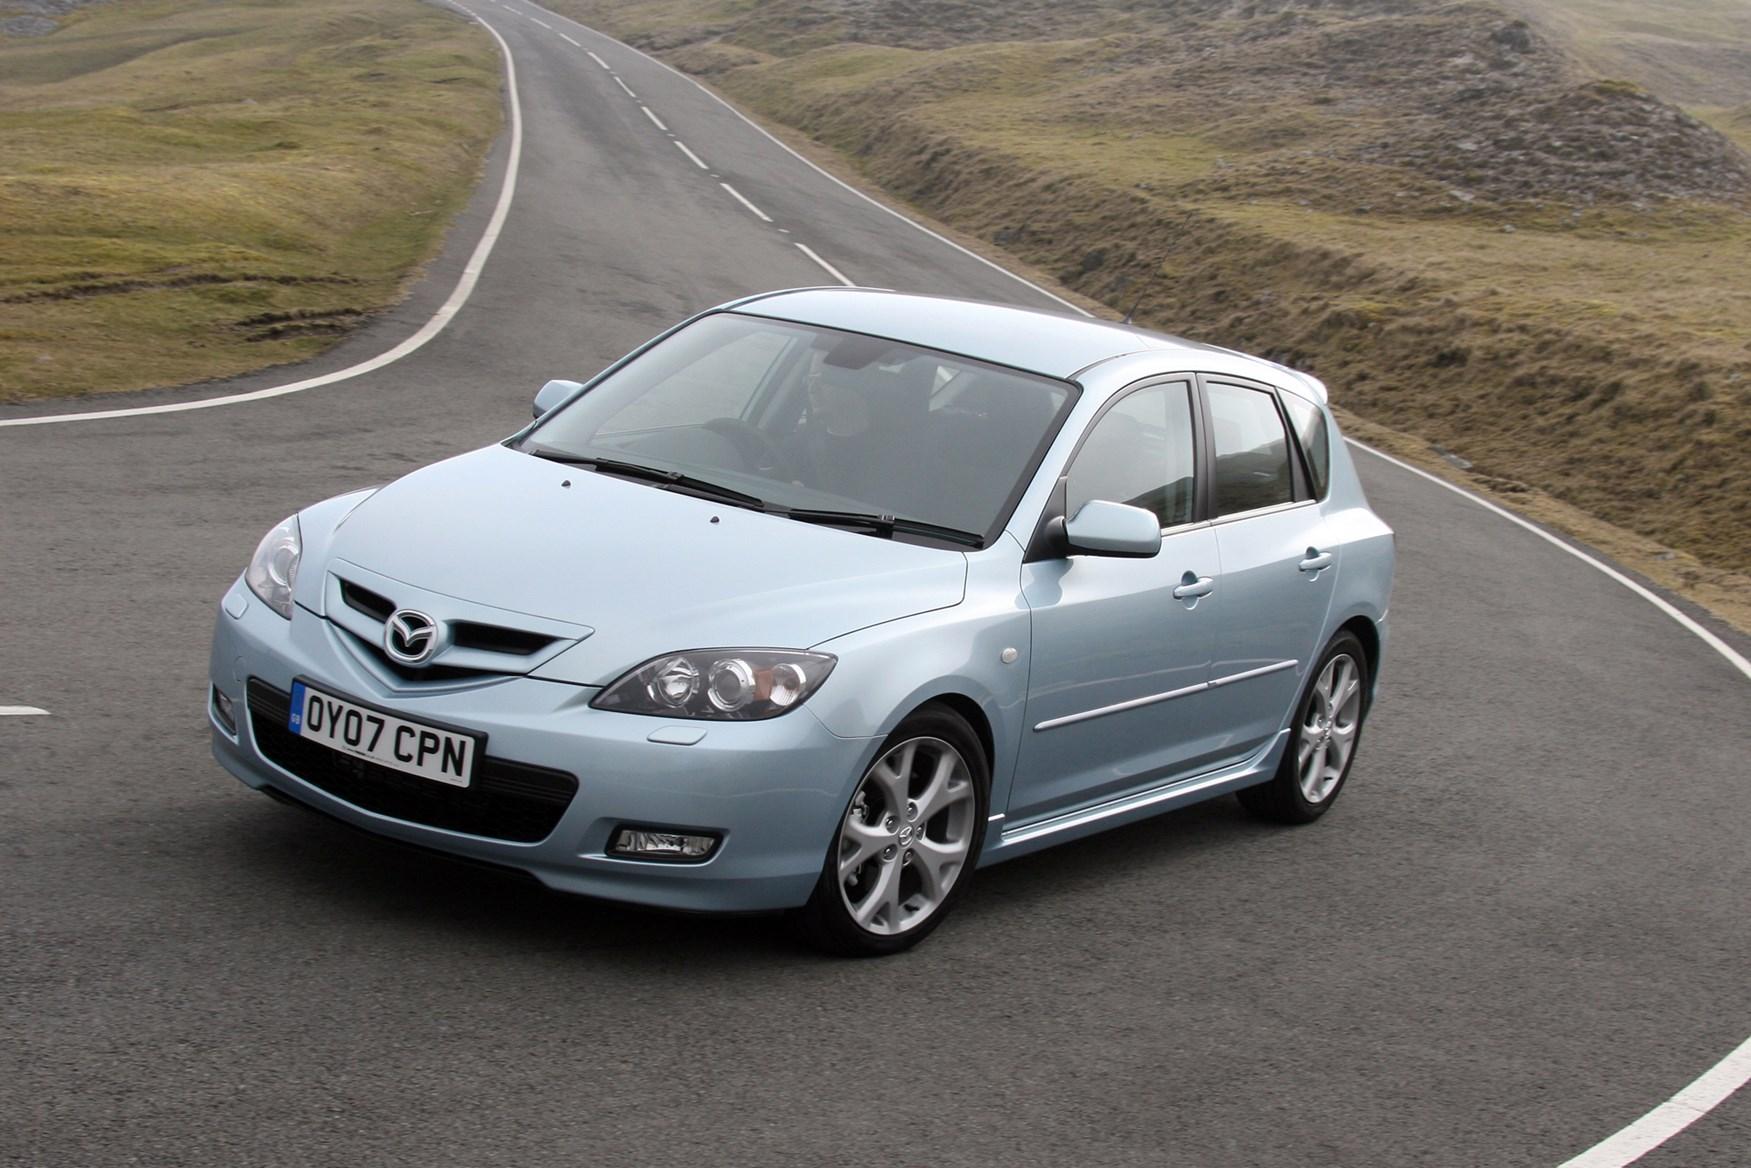 mazda 3 hatchback review (2004 - 2008) | parkers